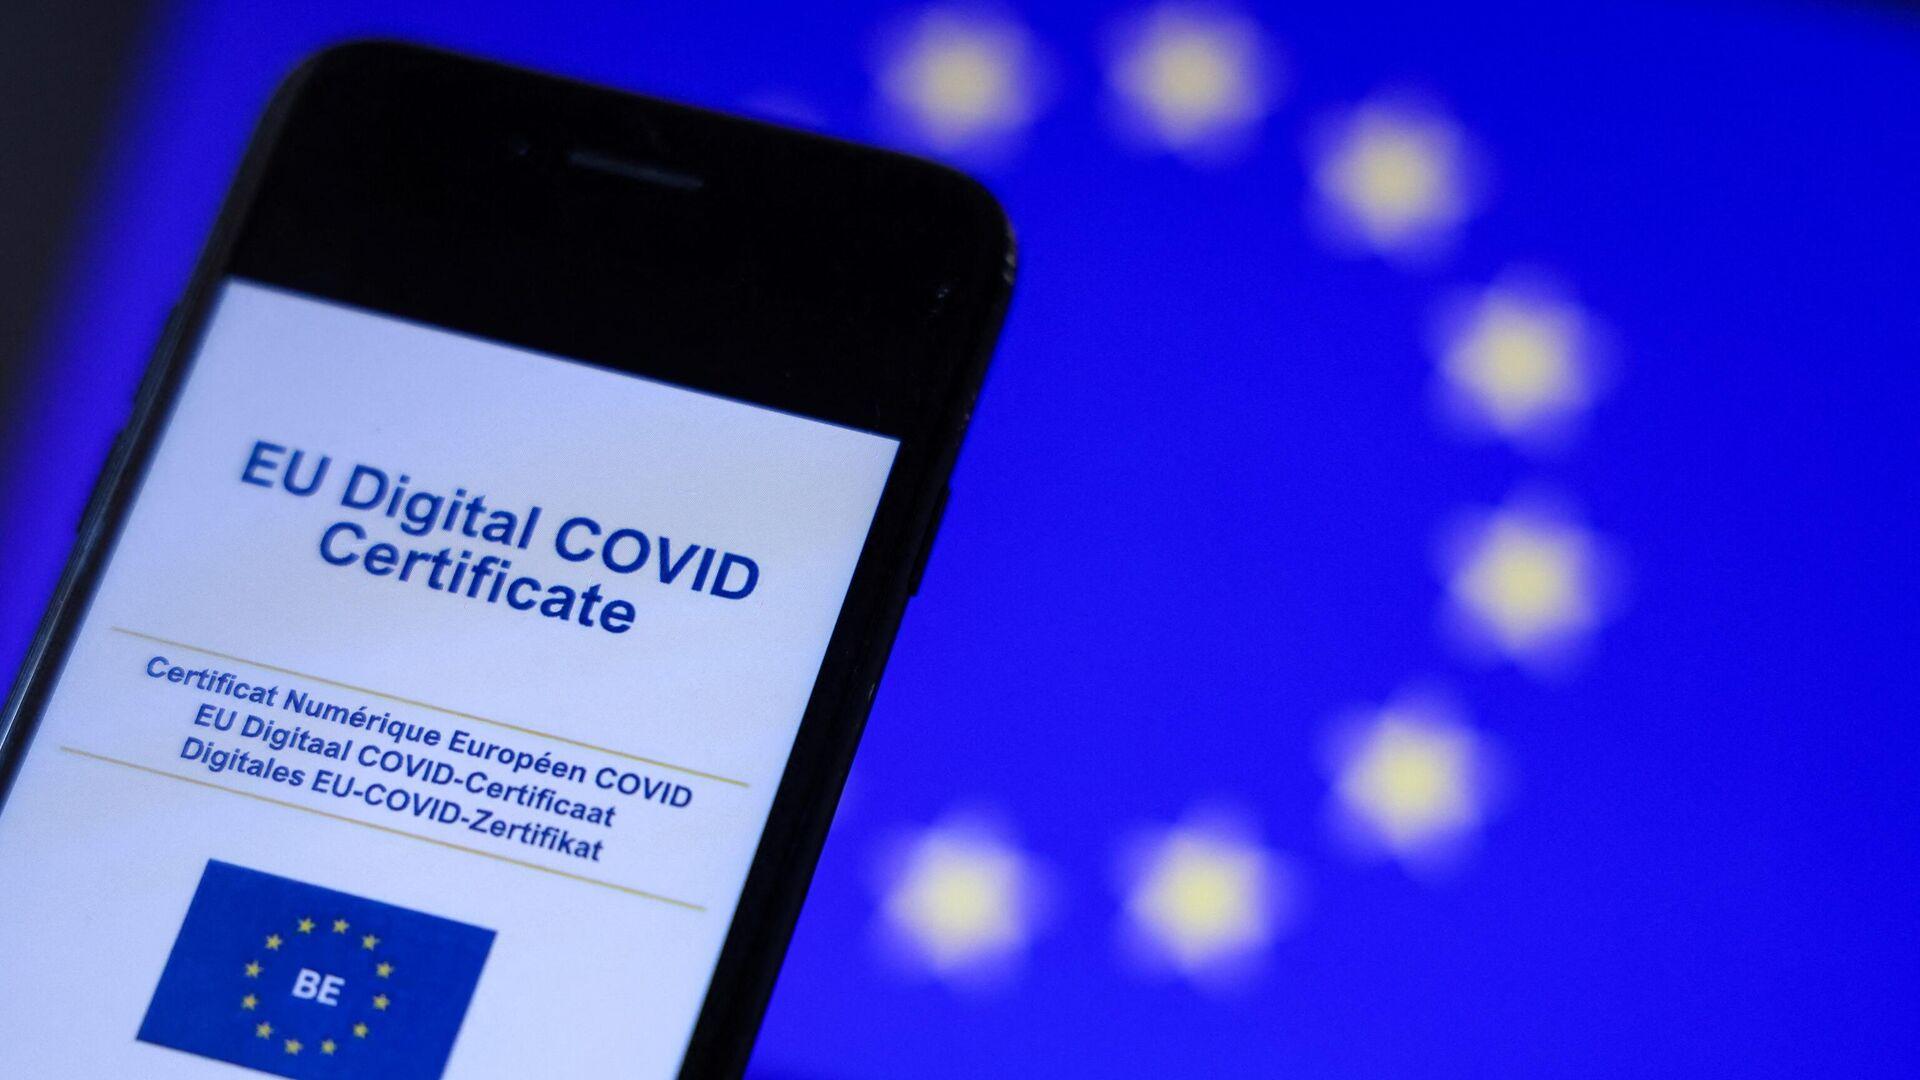 Certificado COVID digital de la Unión Europea - Sputnik Mundo, 1920, 28.06.2021